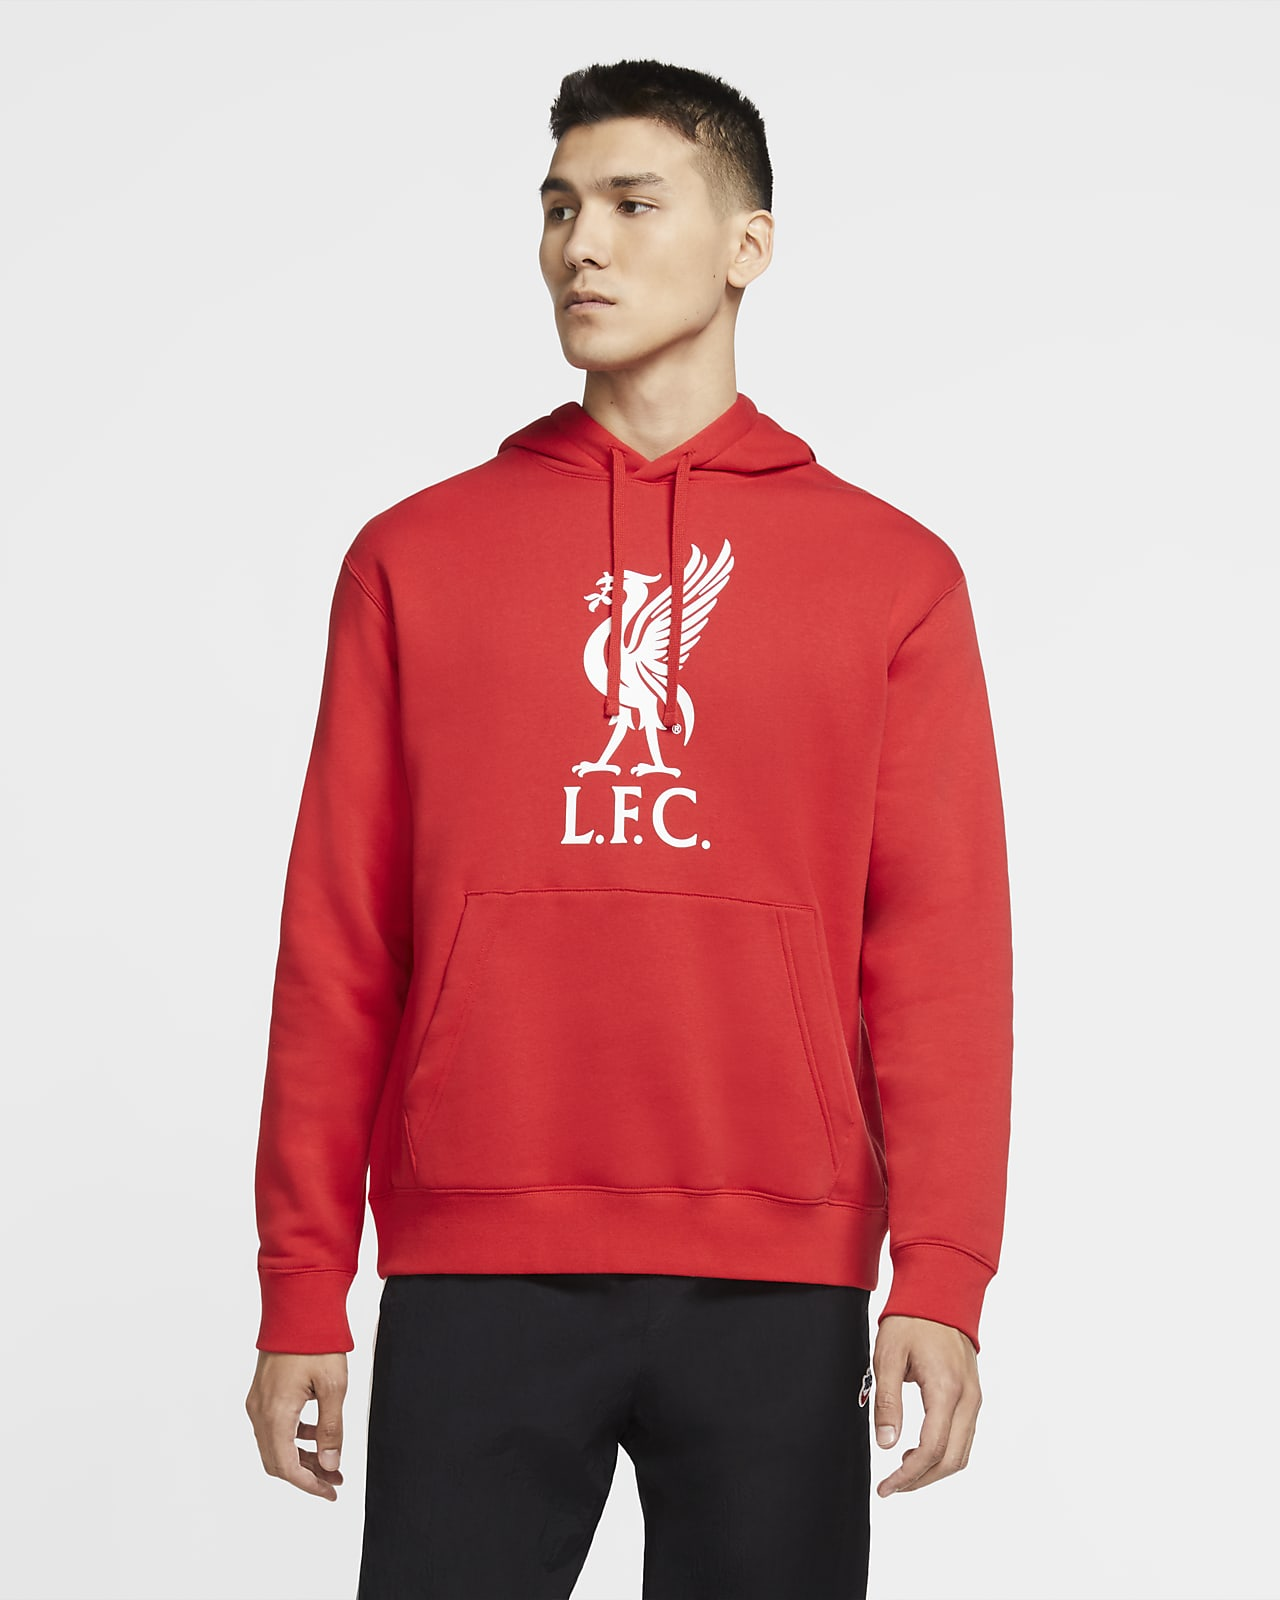 Liverpool FC Club Erkek Kapüşonlu Sweatshirt'ü